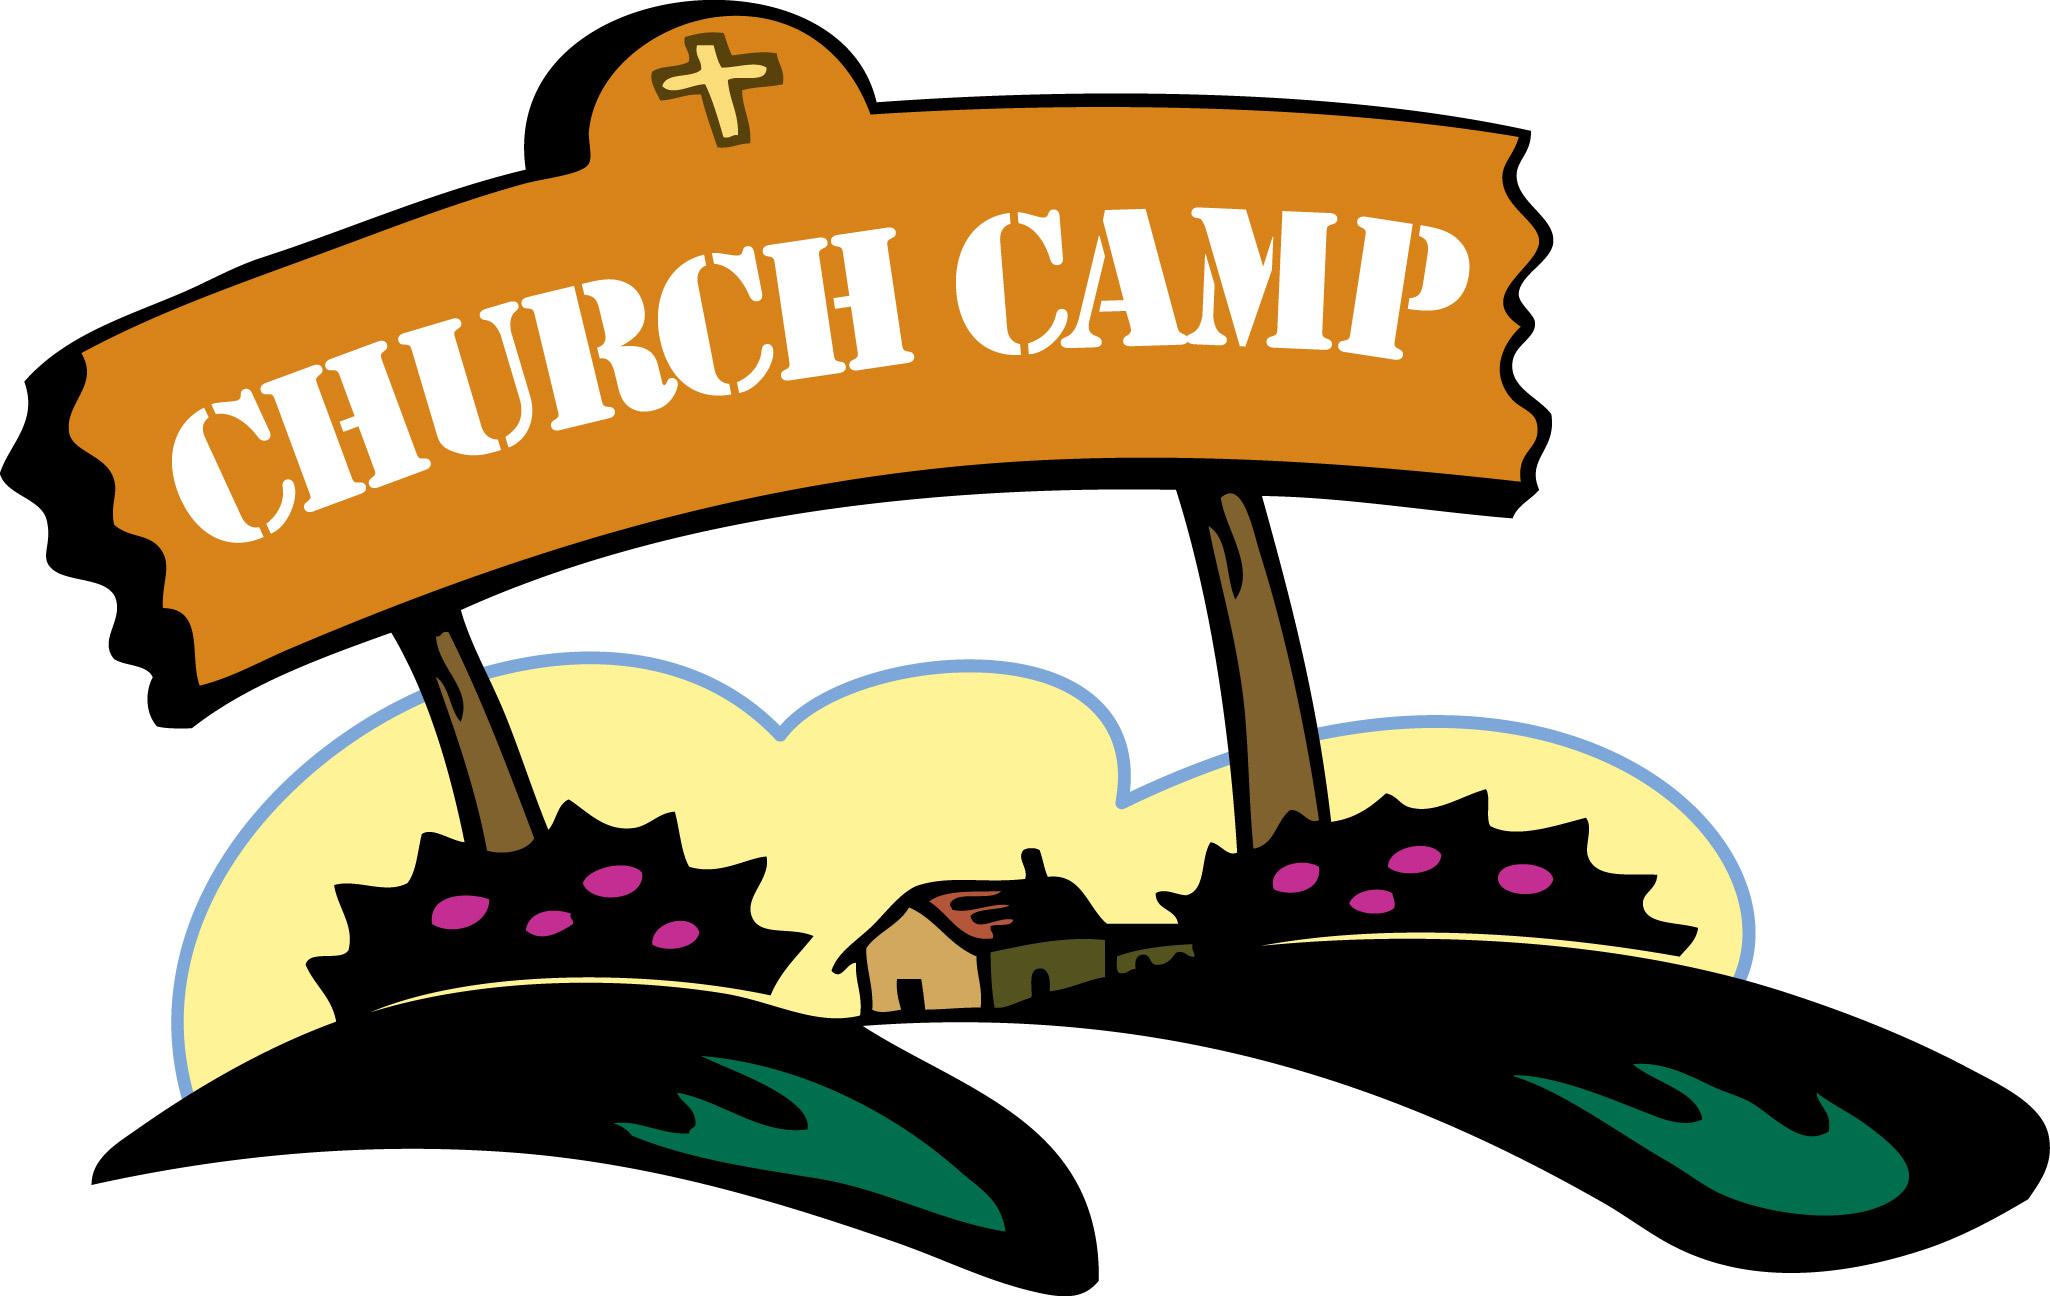 Summer Church Camp Clip Art free image.